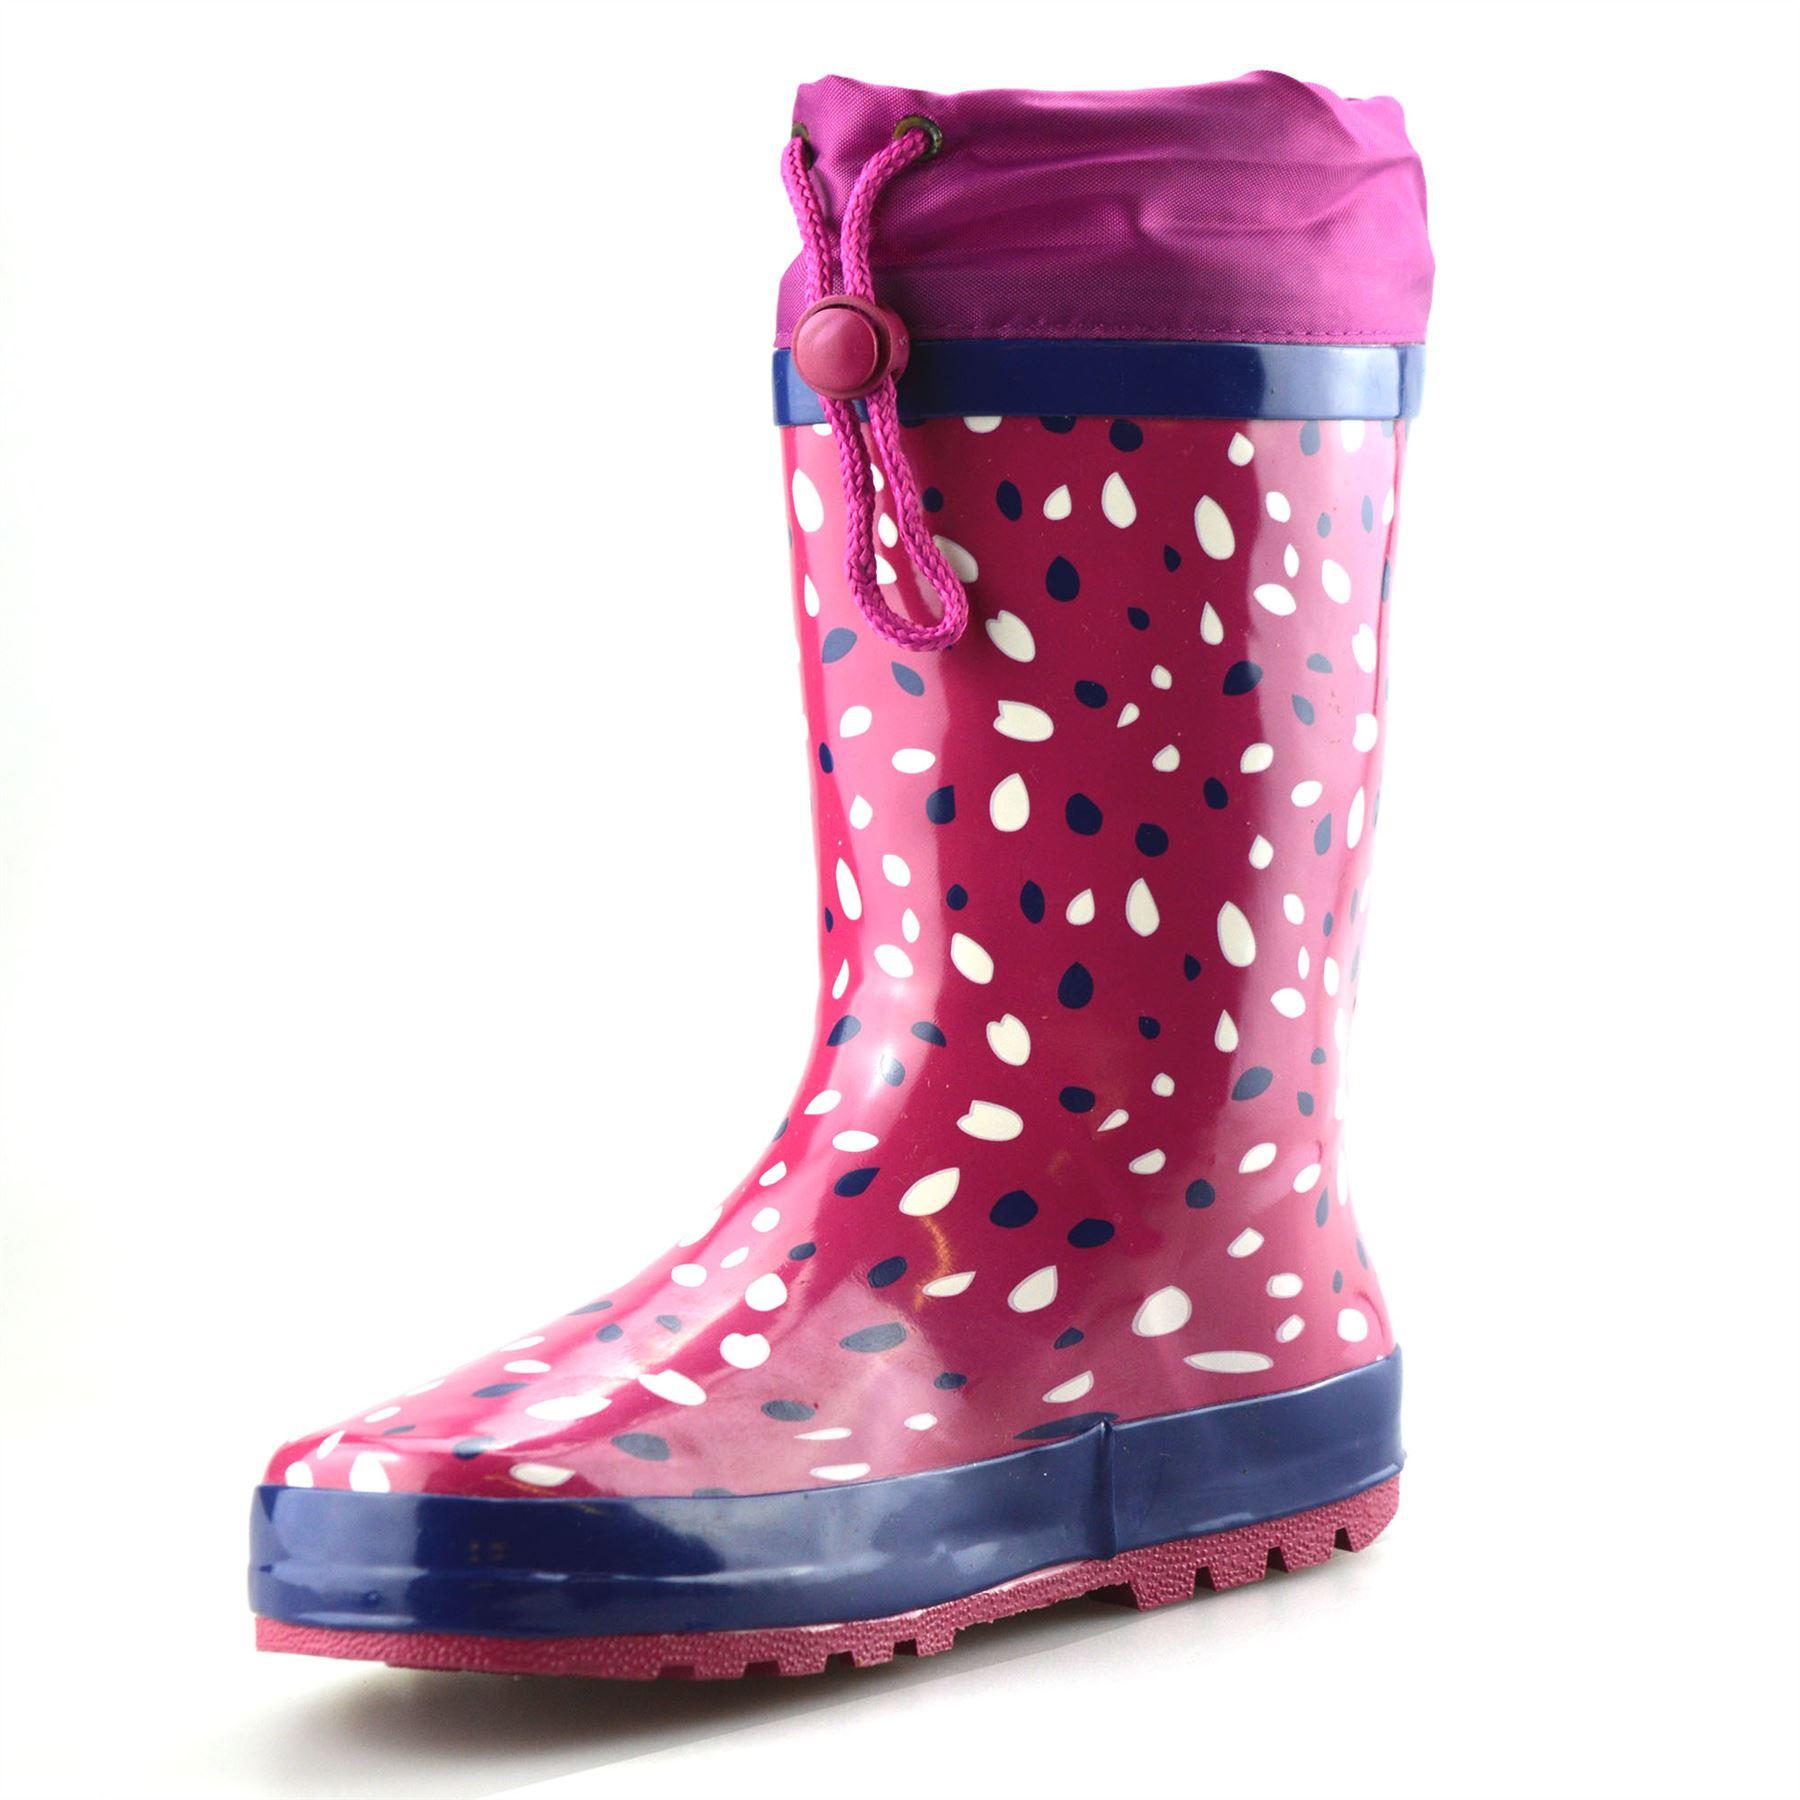 Girls-Boys-Kids-Waterproof-Wellies-Winter-Rain-Snow-Wellingtons-Boots-Shoes-Size